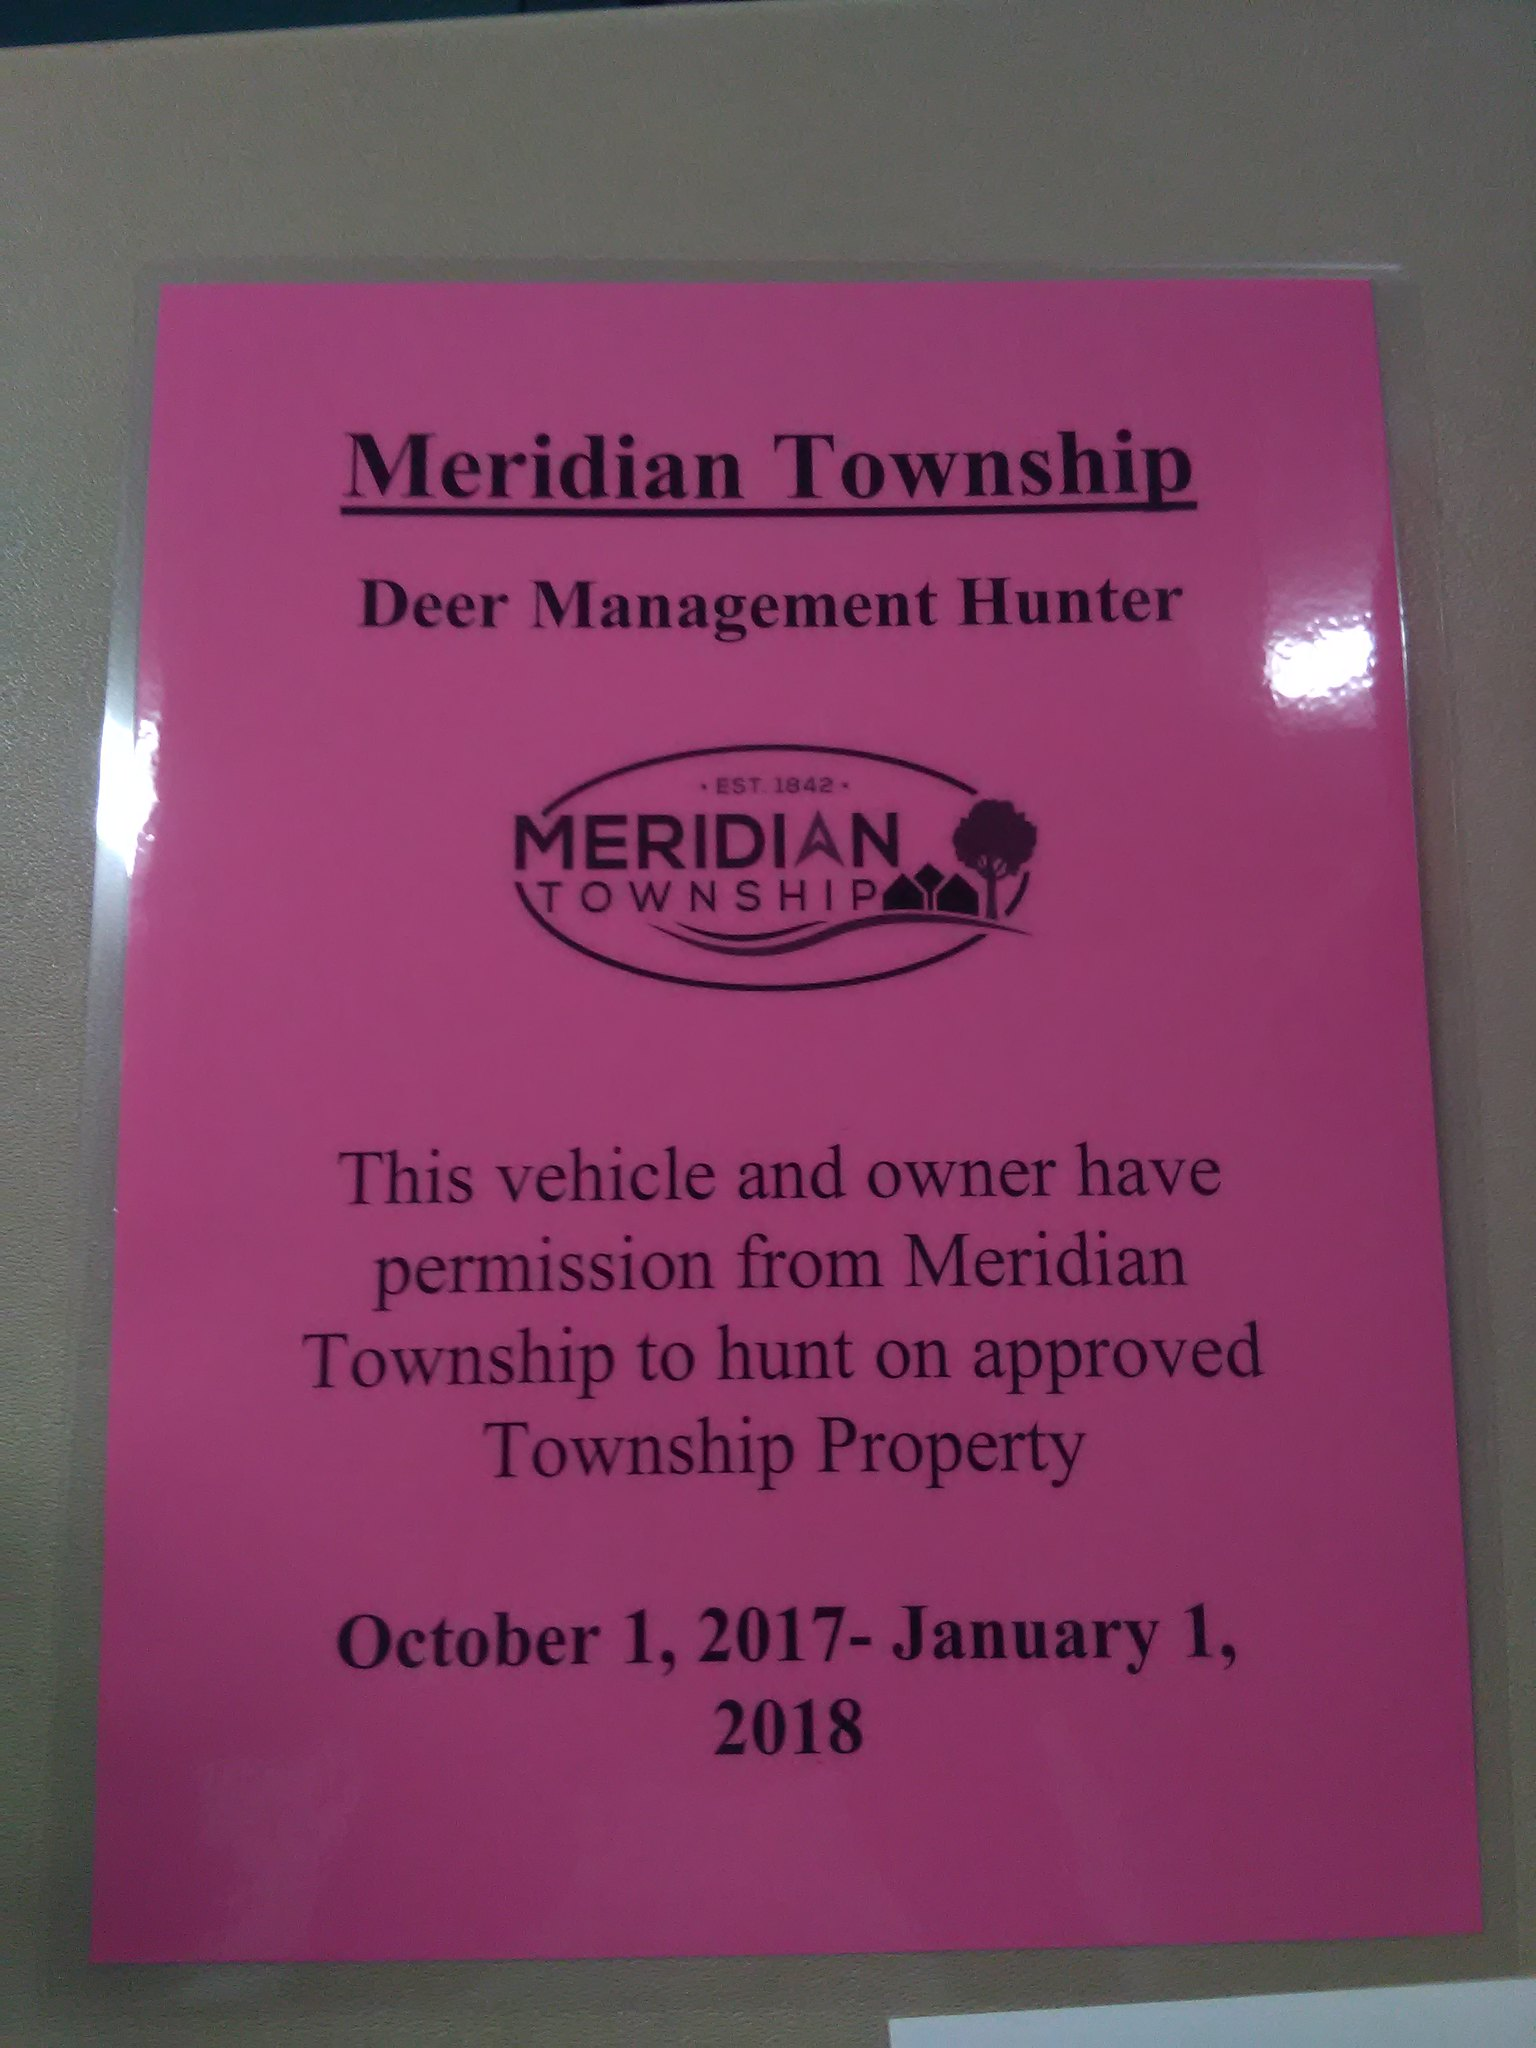 Members attend Meridian Township Deer Control Archery Workshop